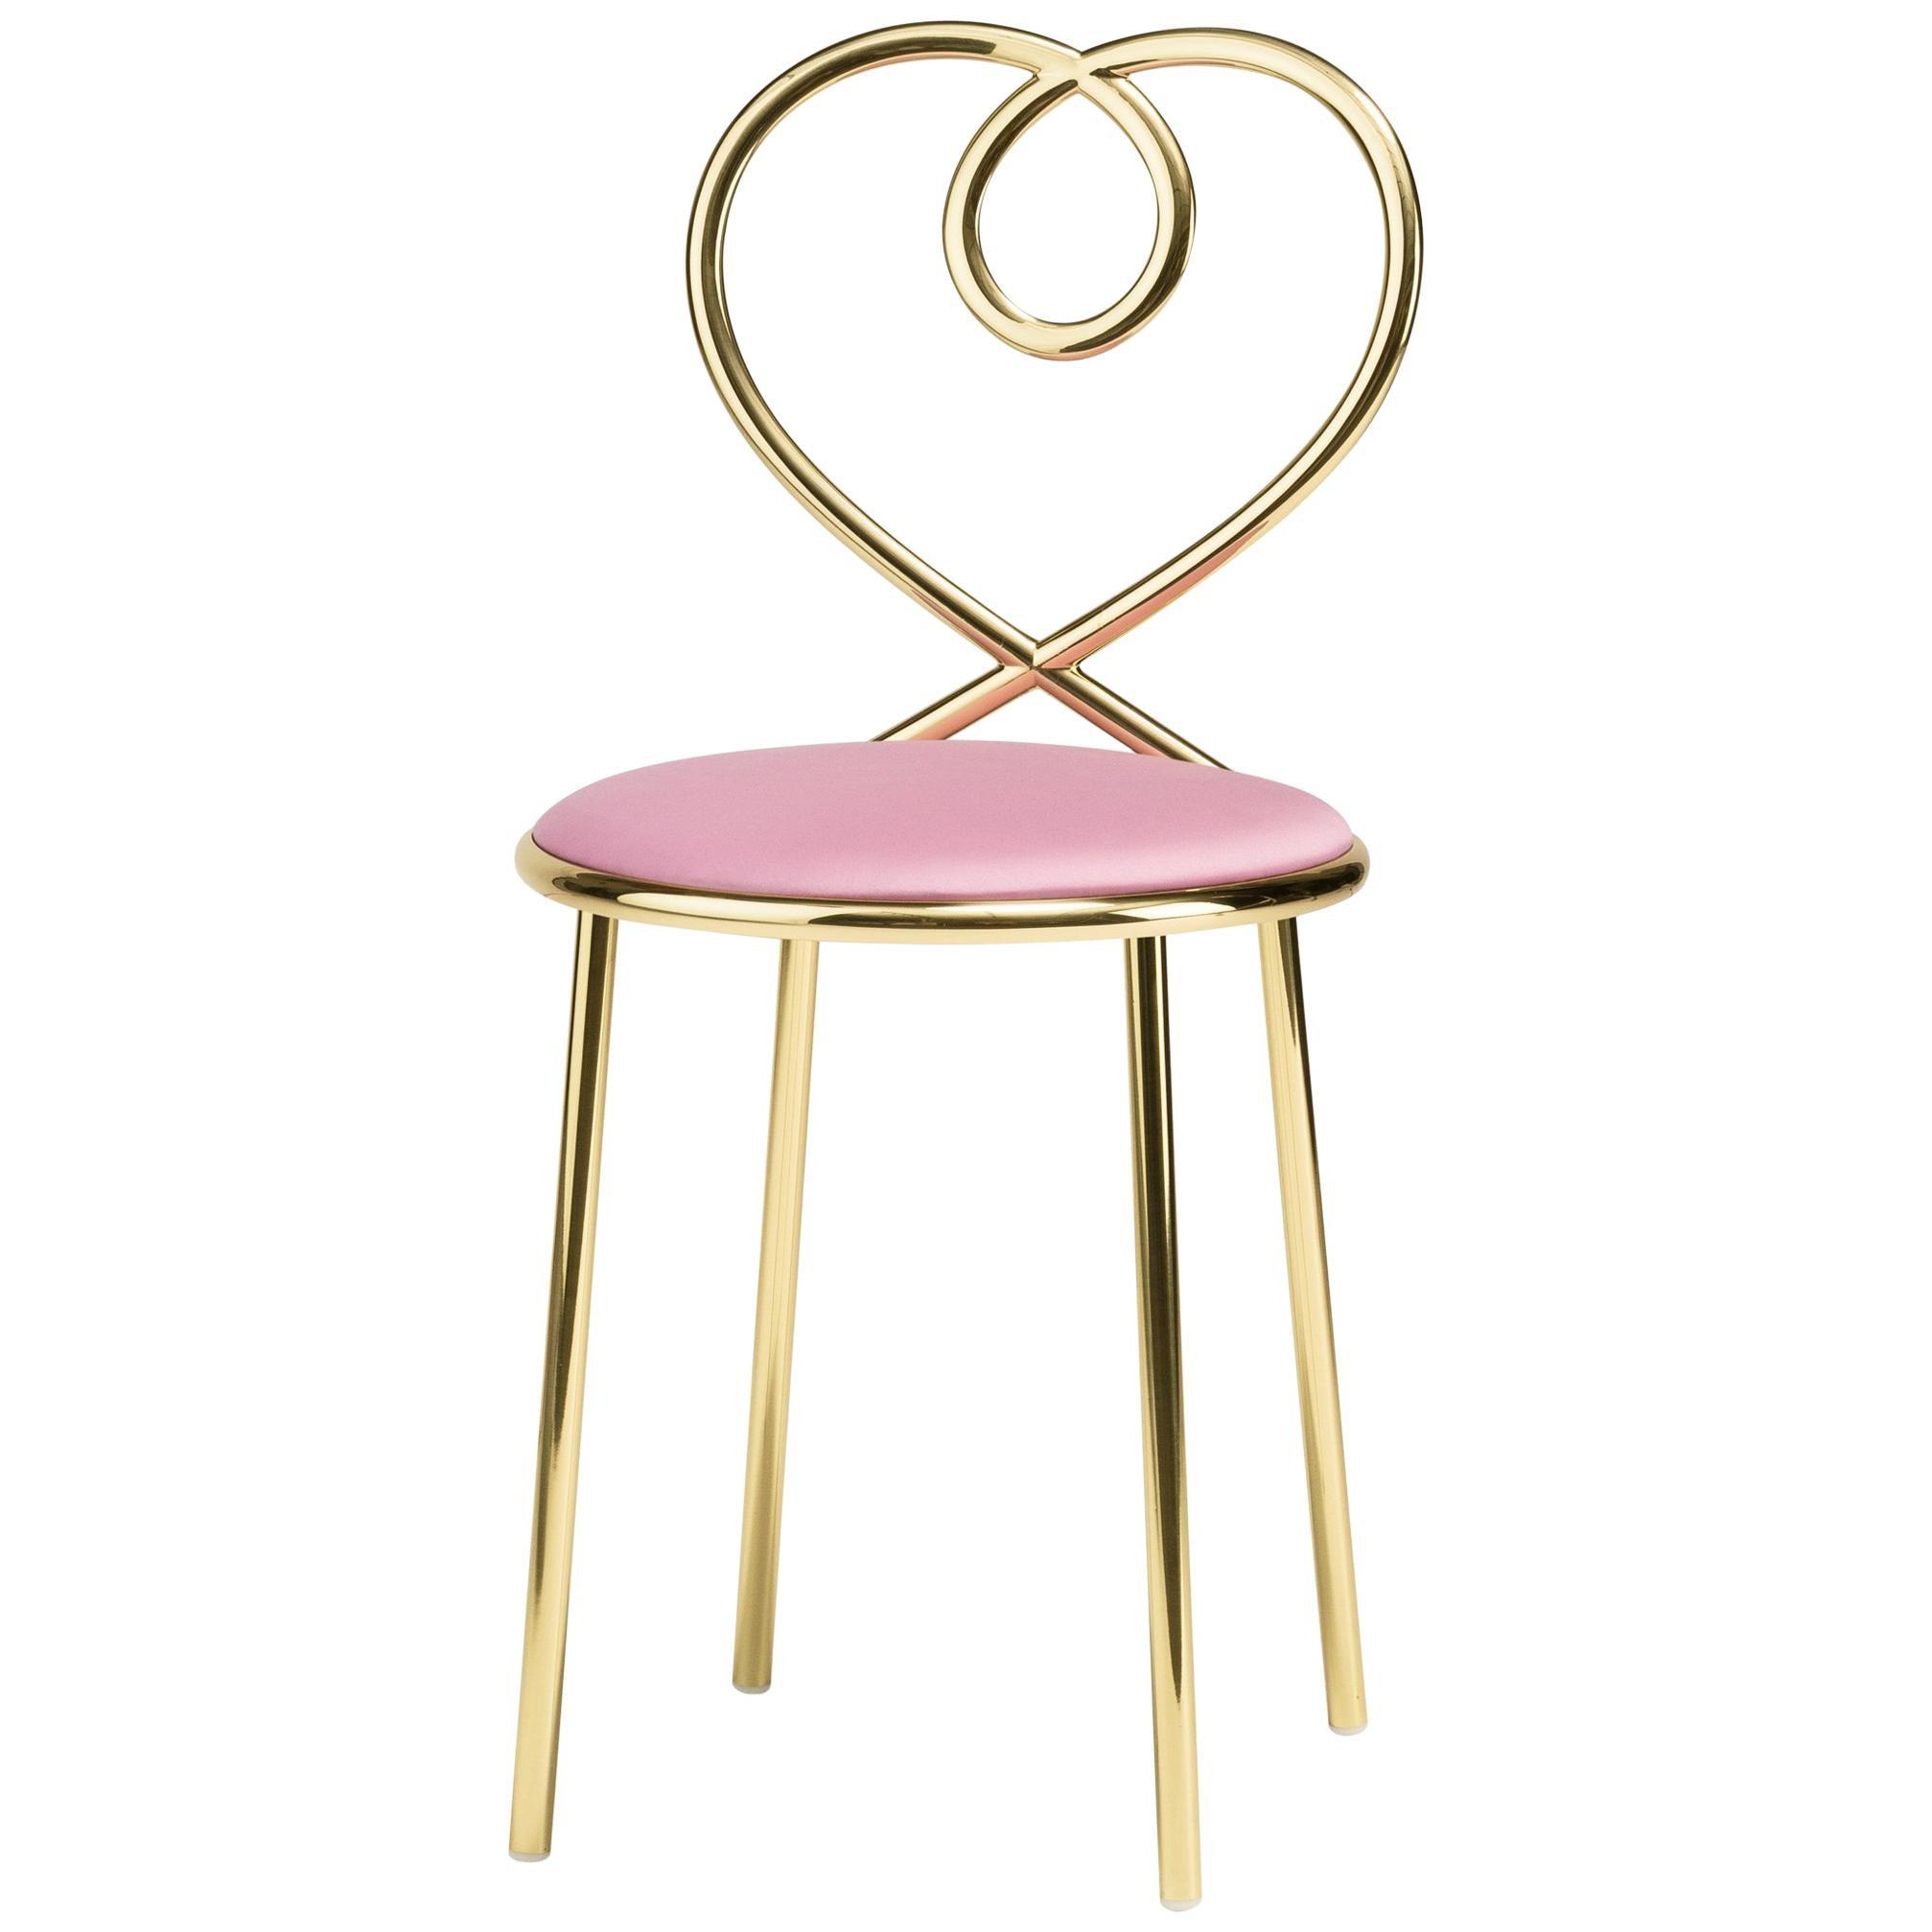 Ghidini 1961 Love Chair Ninfea in Polished Brass by Nika Zupanc